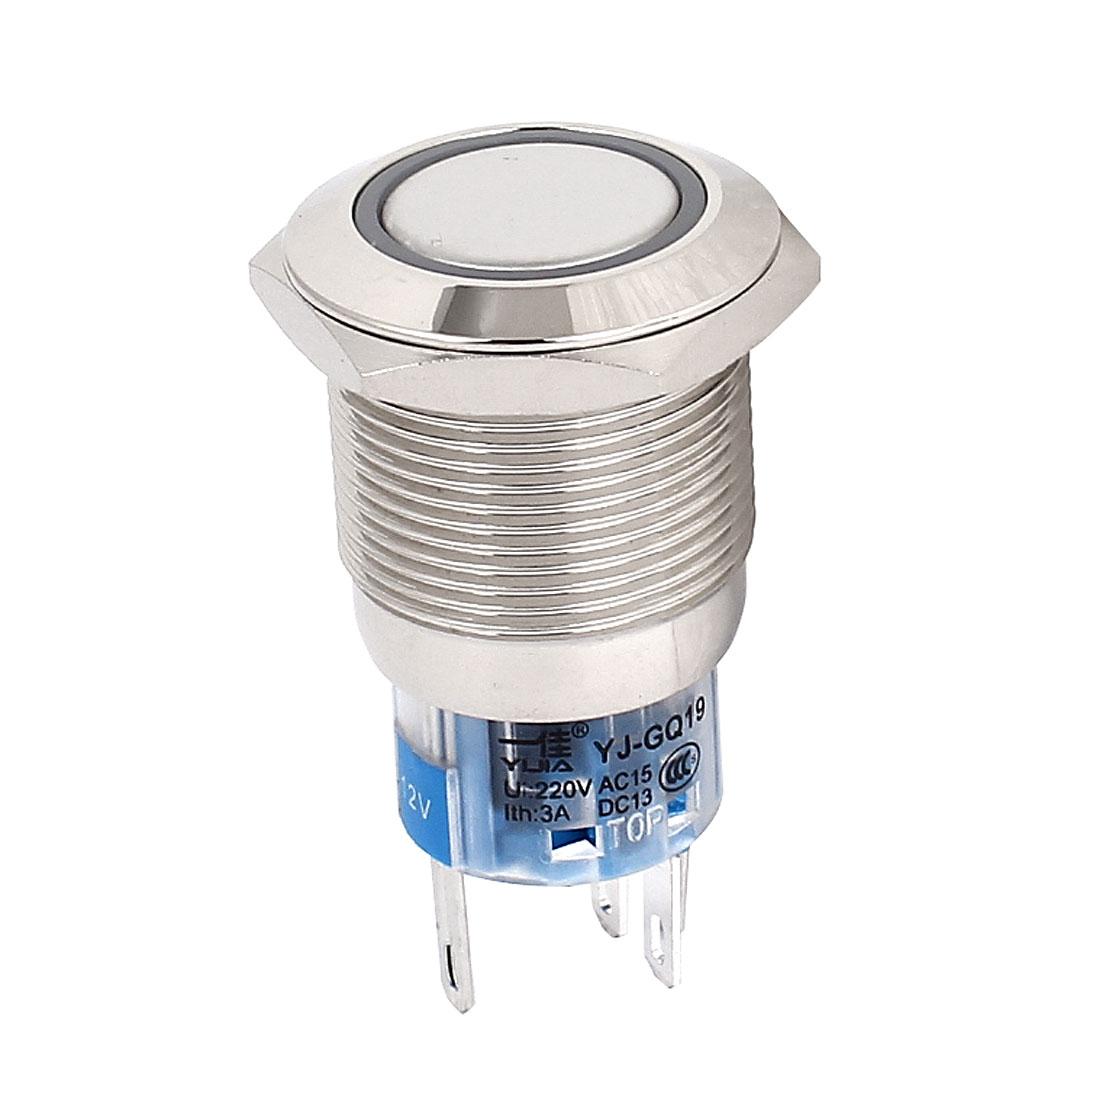 White Angel Eye Metal LED Latching 16mm Push Button Switch Car Dash 12V